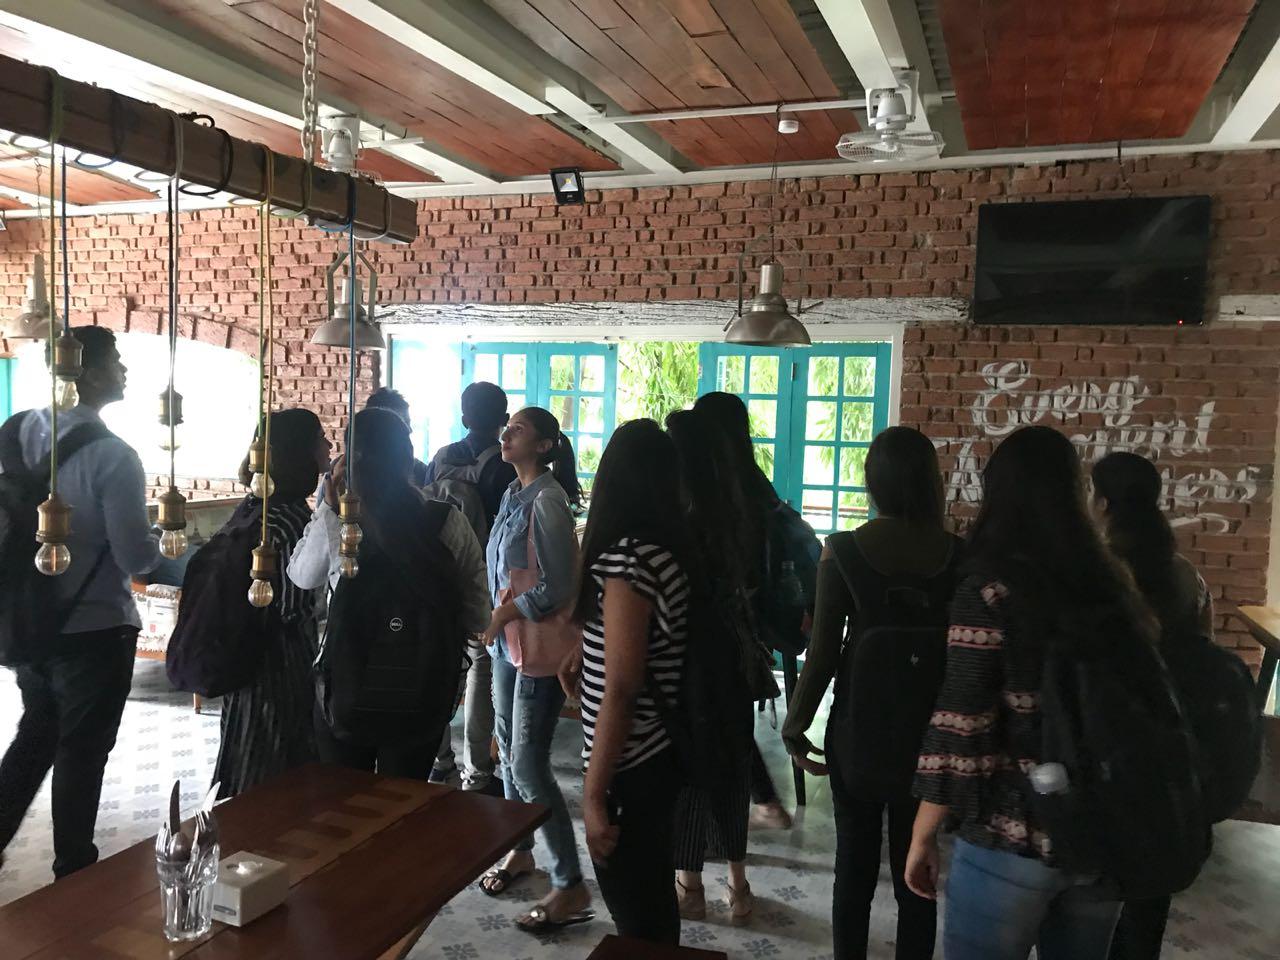 Interior Students at Social & Easy Tiger  interior students - IMG 20180705 WA0024 - Interior Students at Social & Easy Tiger | Site Visit